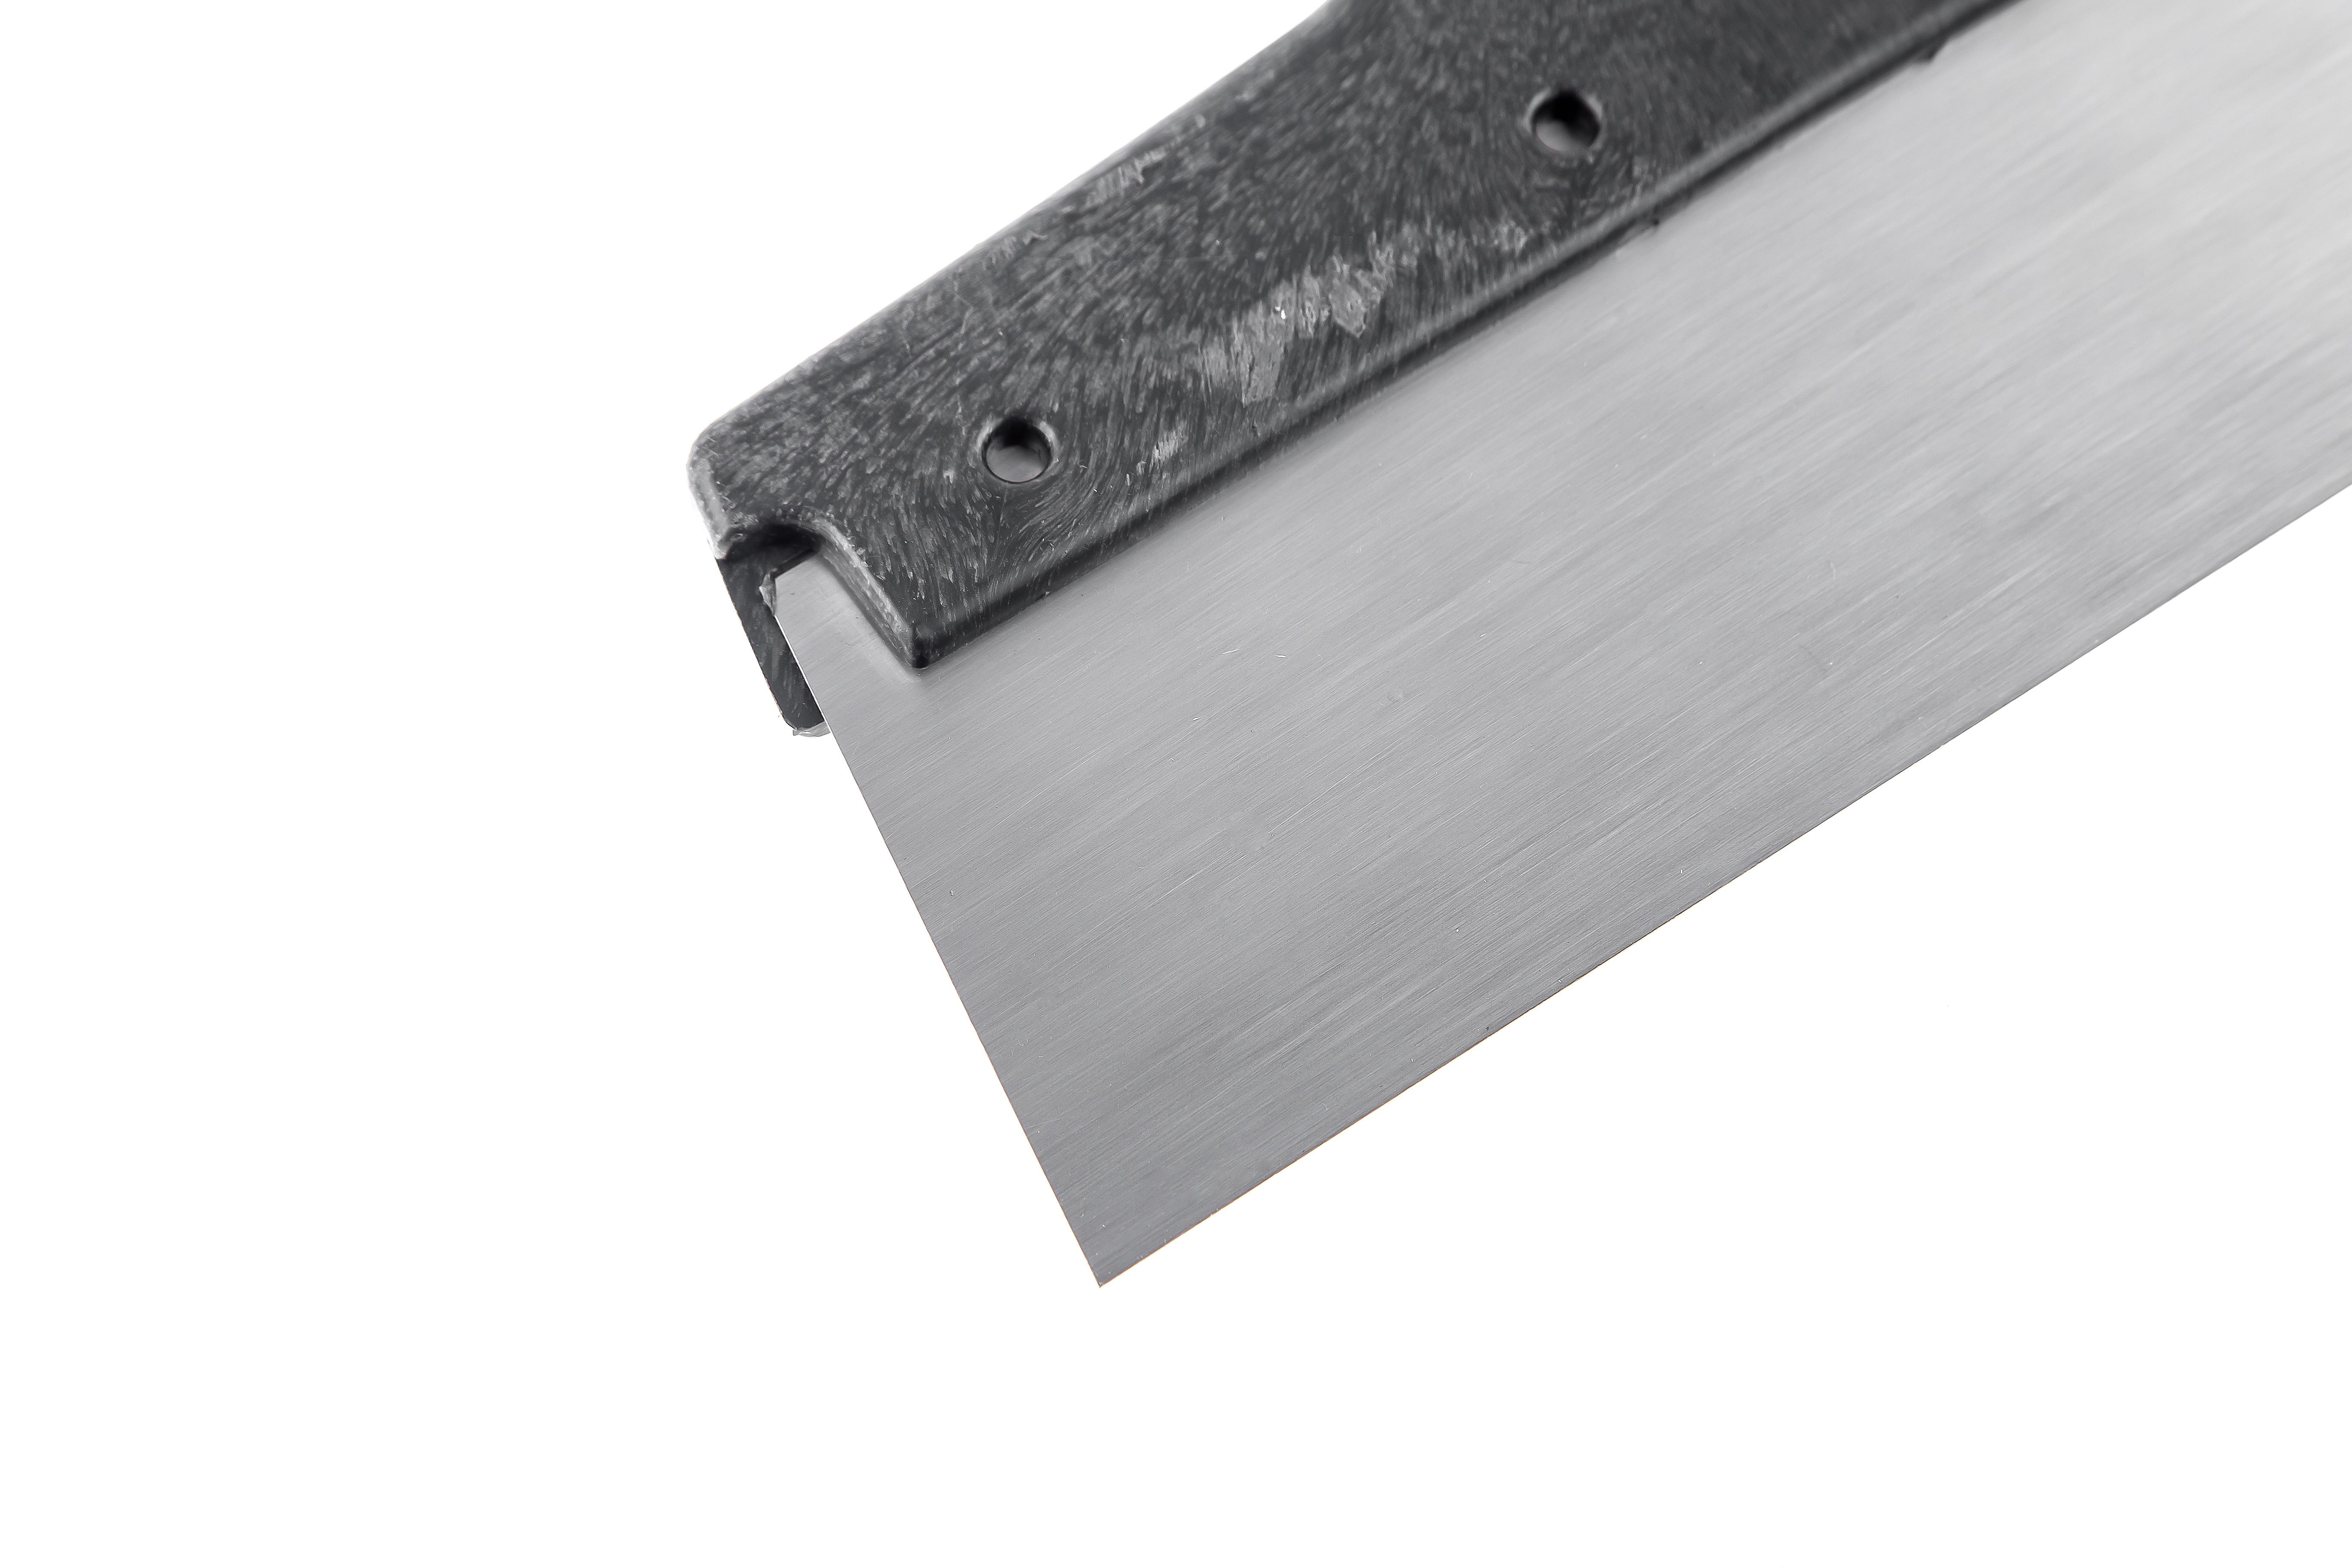 Шпатель Hammer 238-007